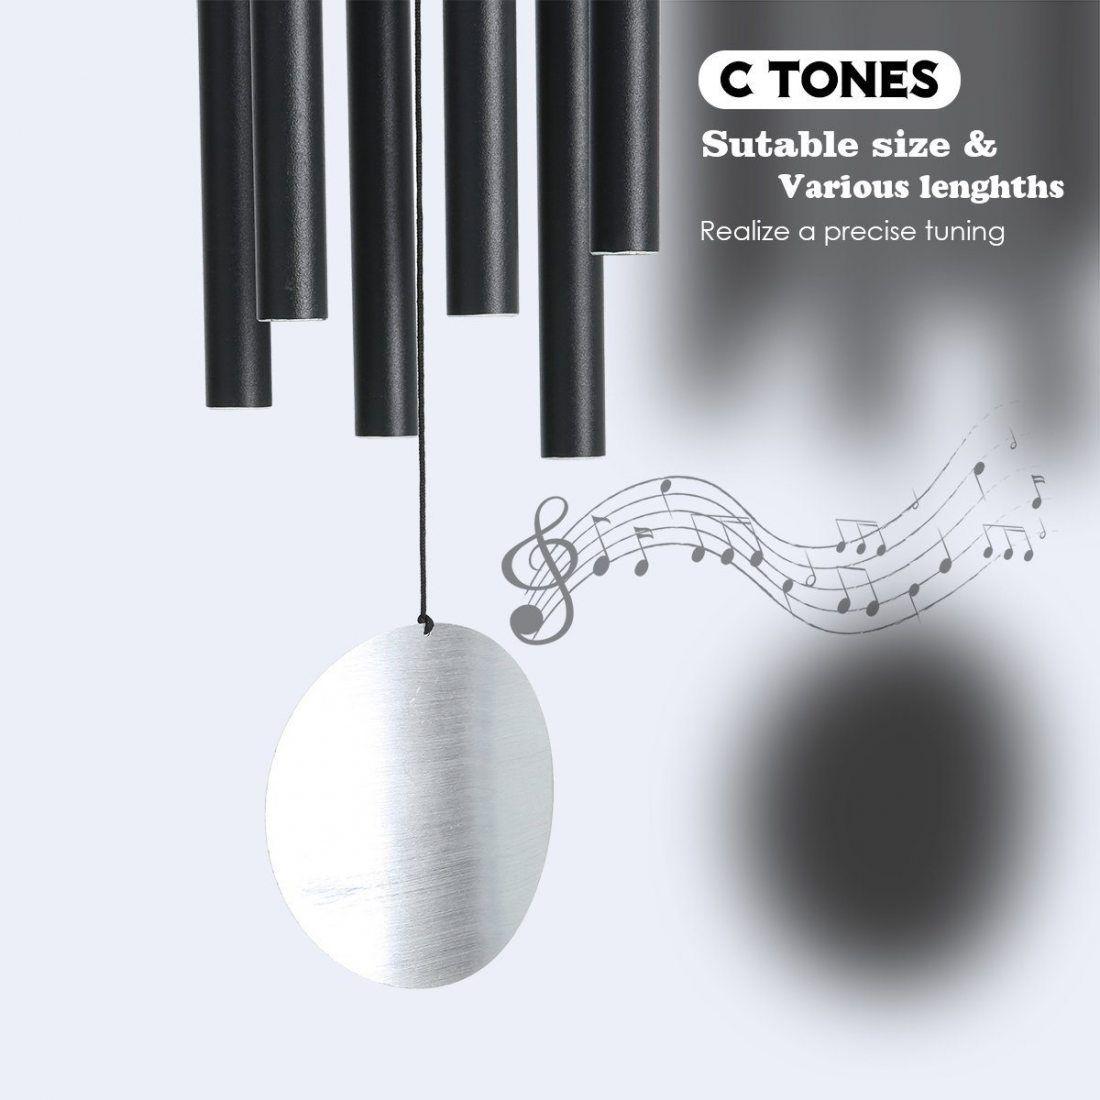 WuulihuiFRV6 (Nouveau Carillon Musical)